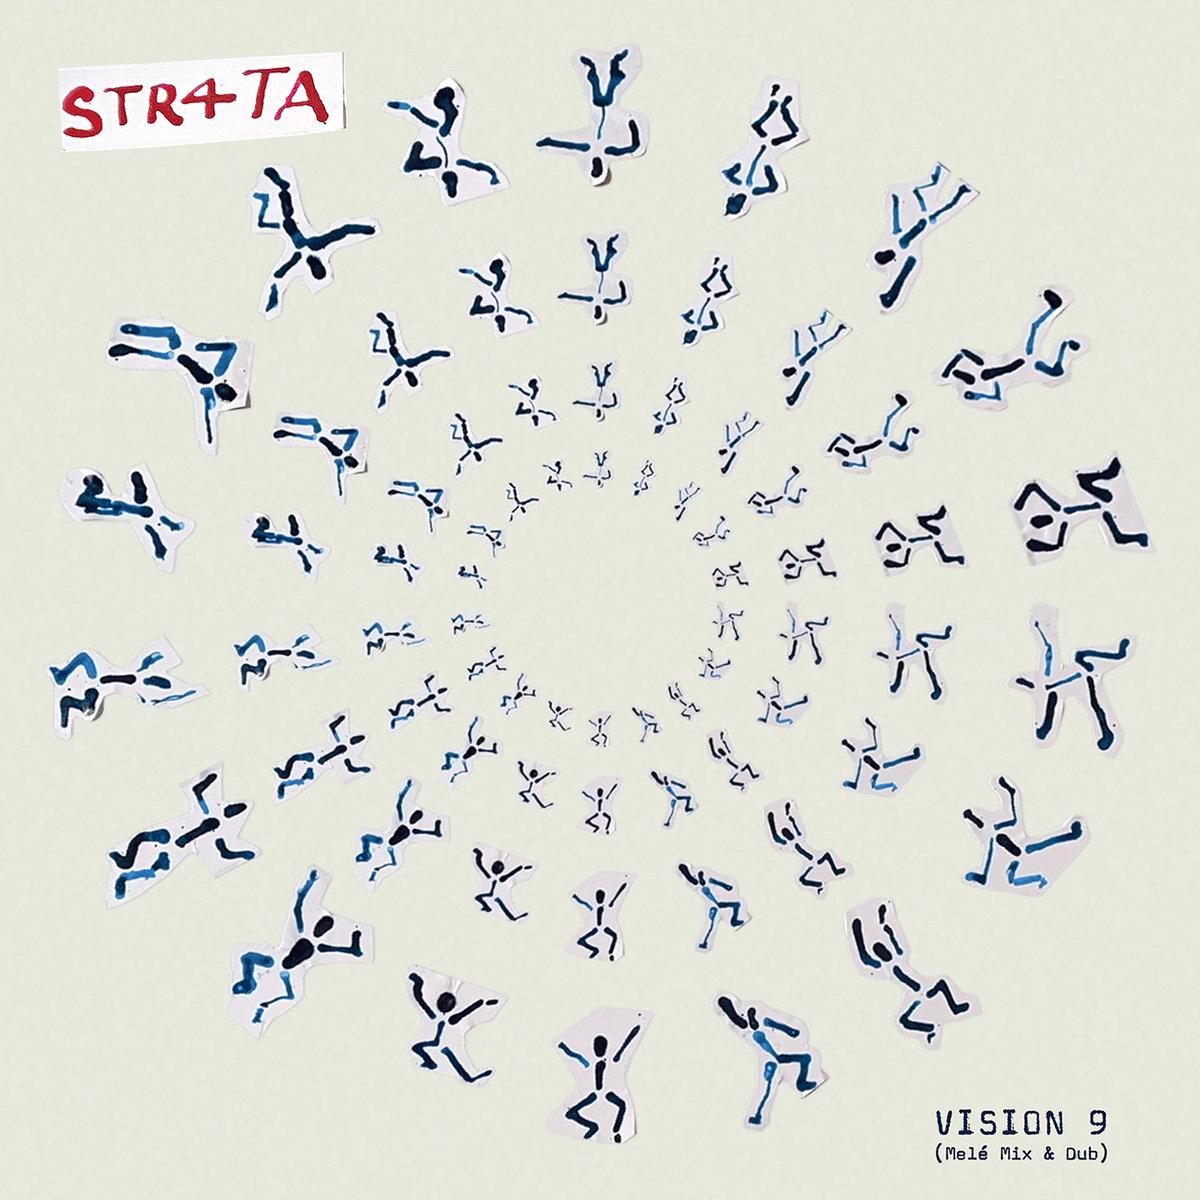 str4ta Vision 9 (Melé Mix & Dub)